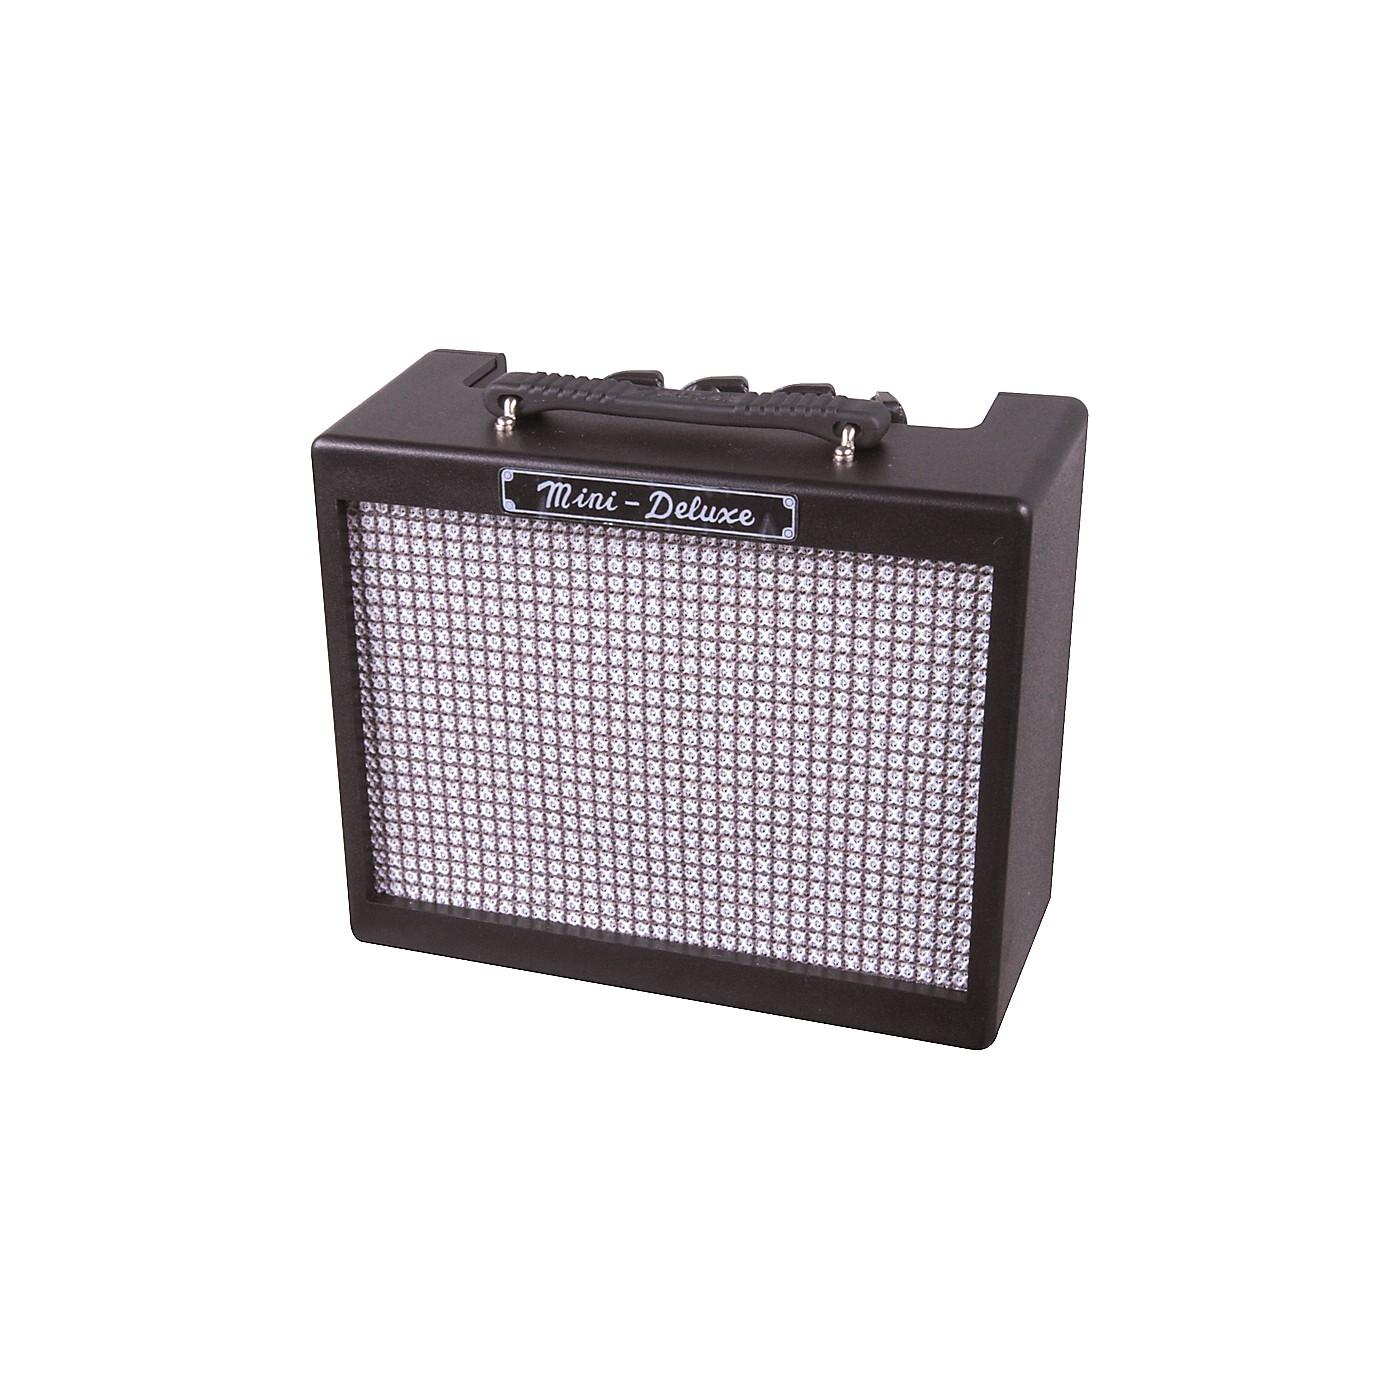 Fender Mini Deluxe Amp thumbnail